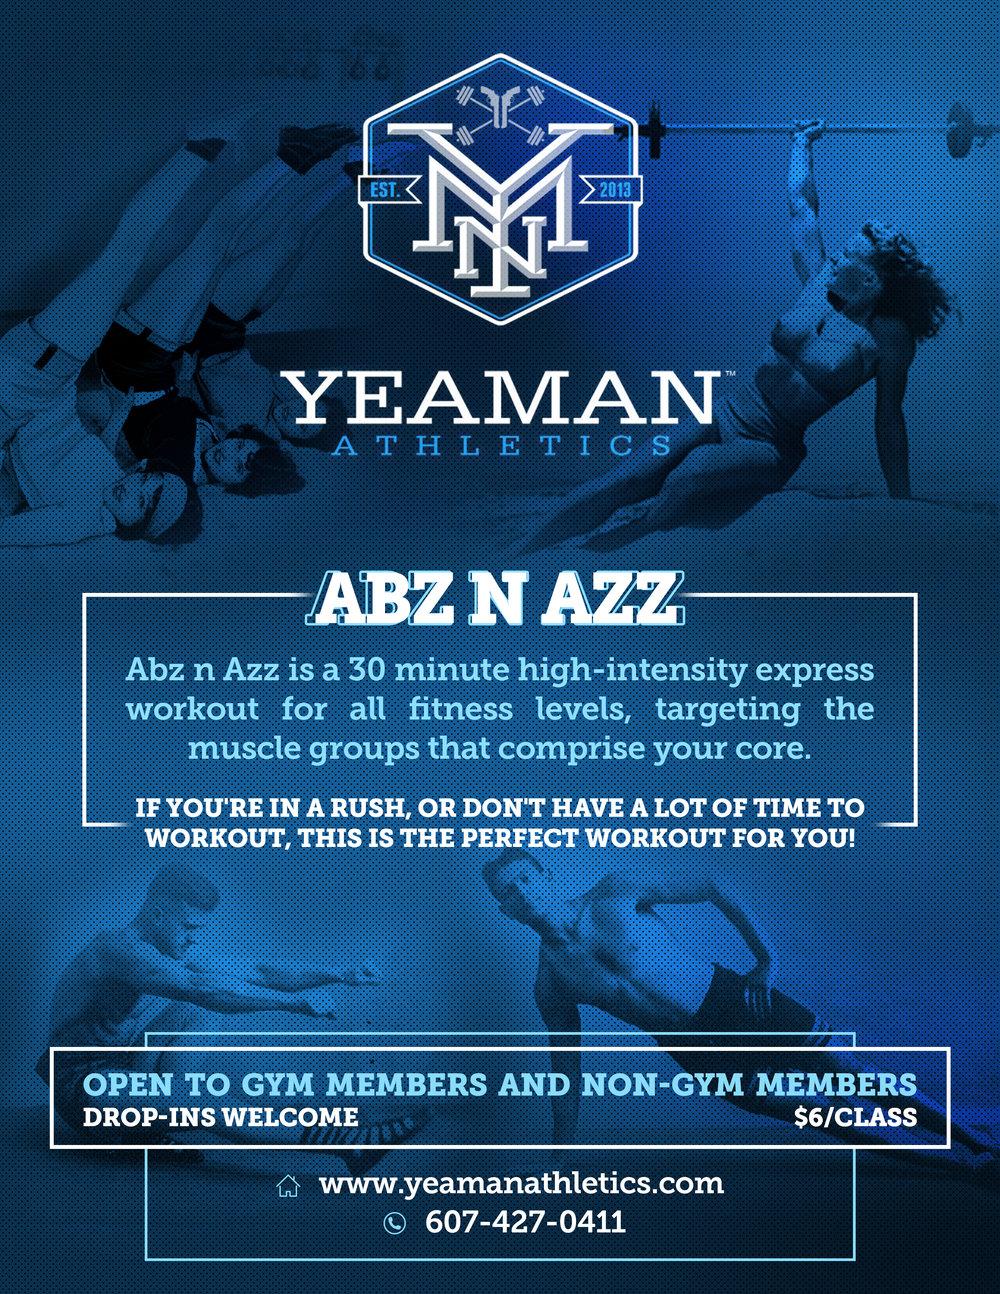 Abz_n_azz_flyer.jpg